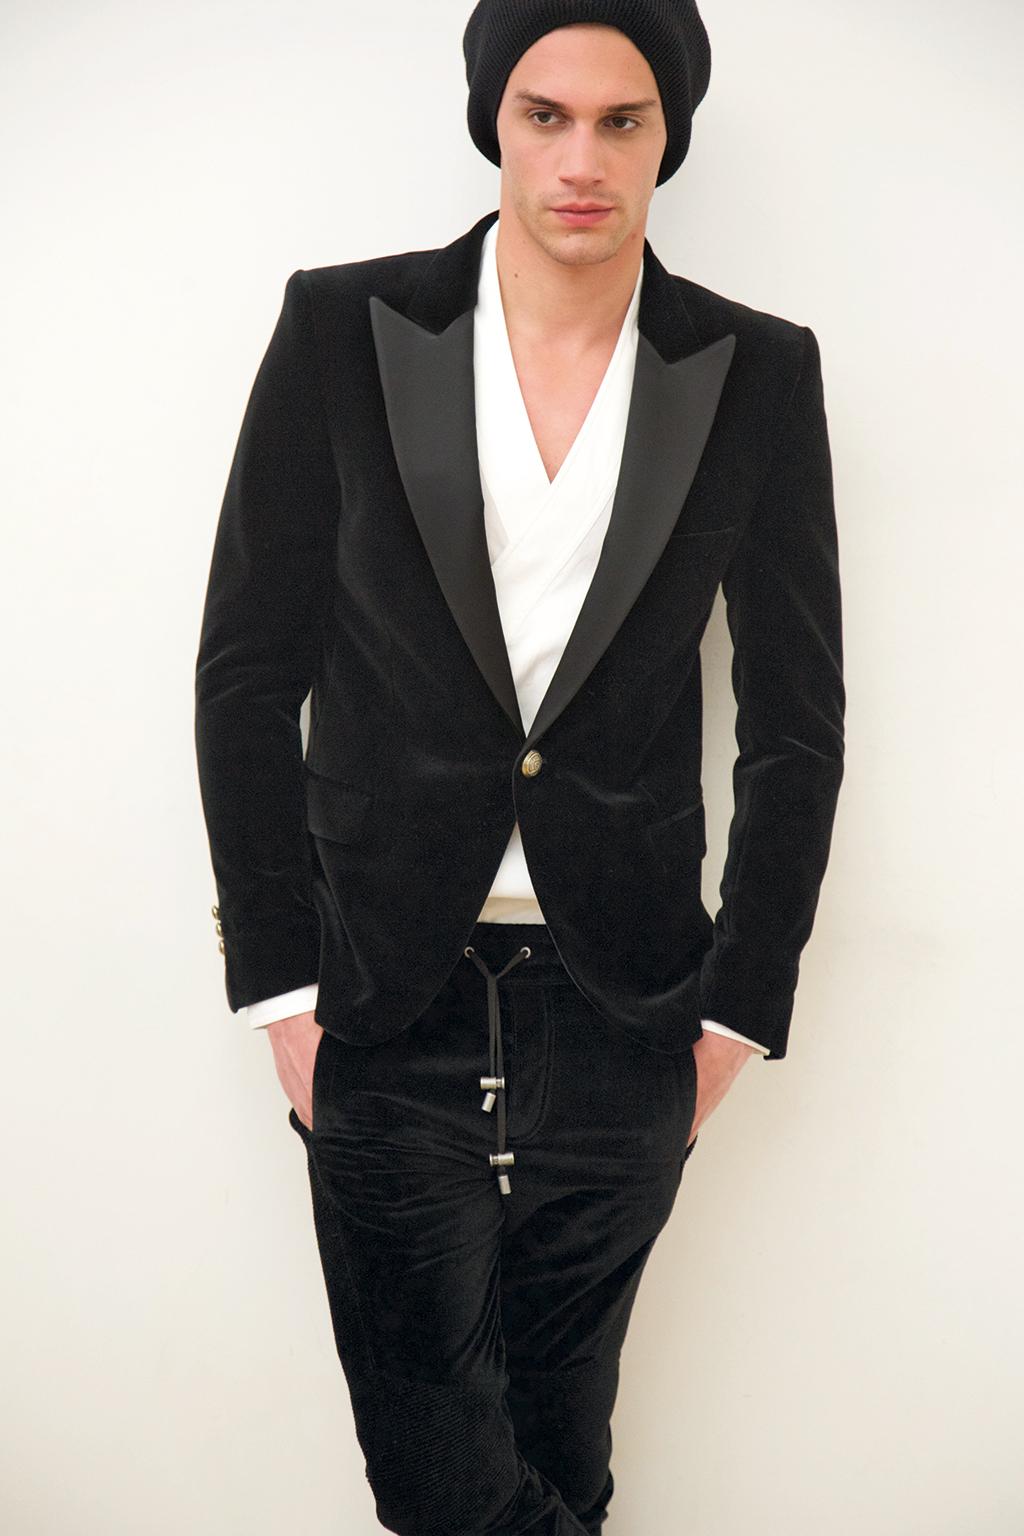 b77c3753 DA MAN Style Exclusive: Olivier Rousteing & Ann-Sofie Johansson on ...